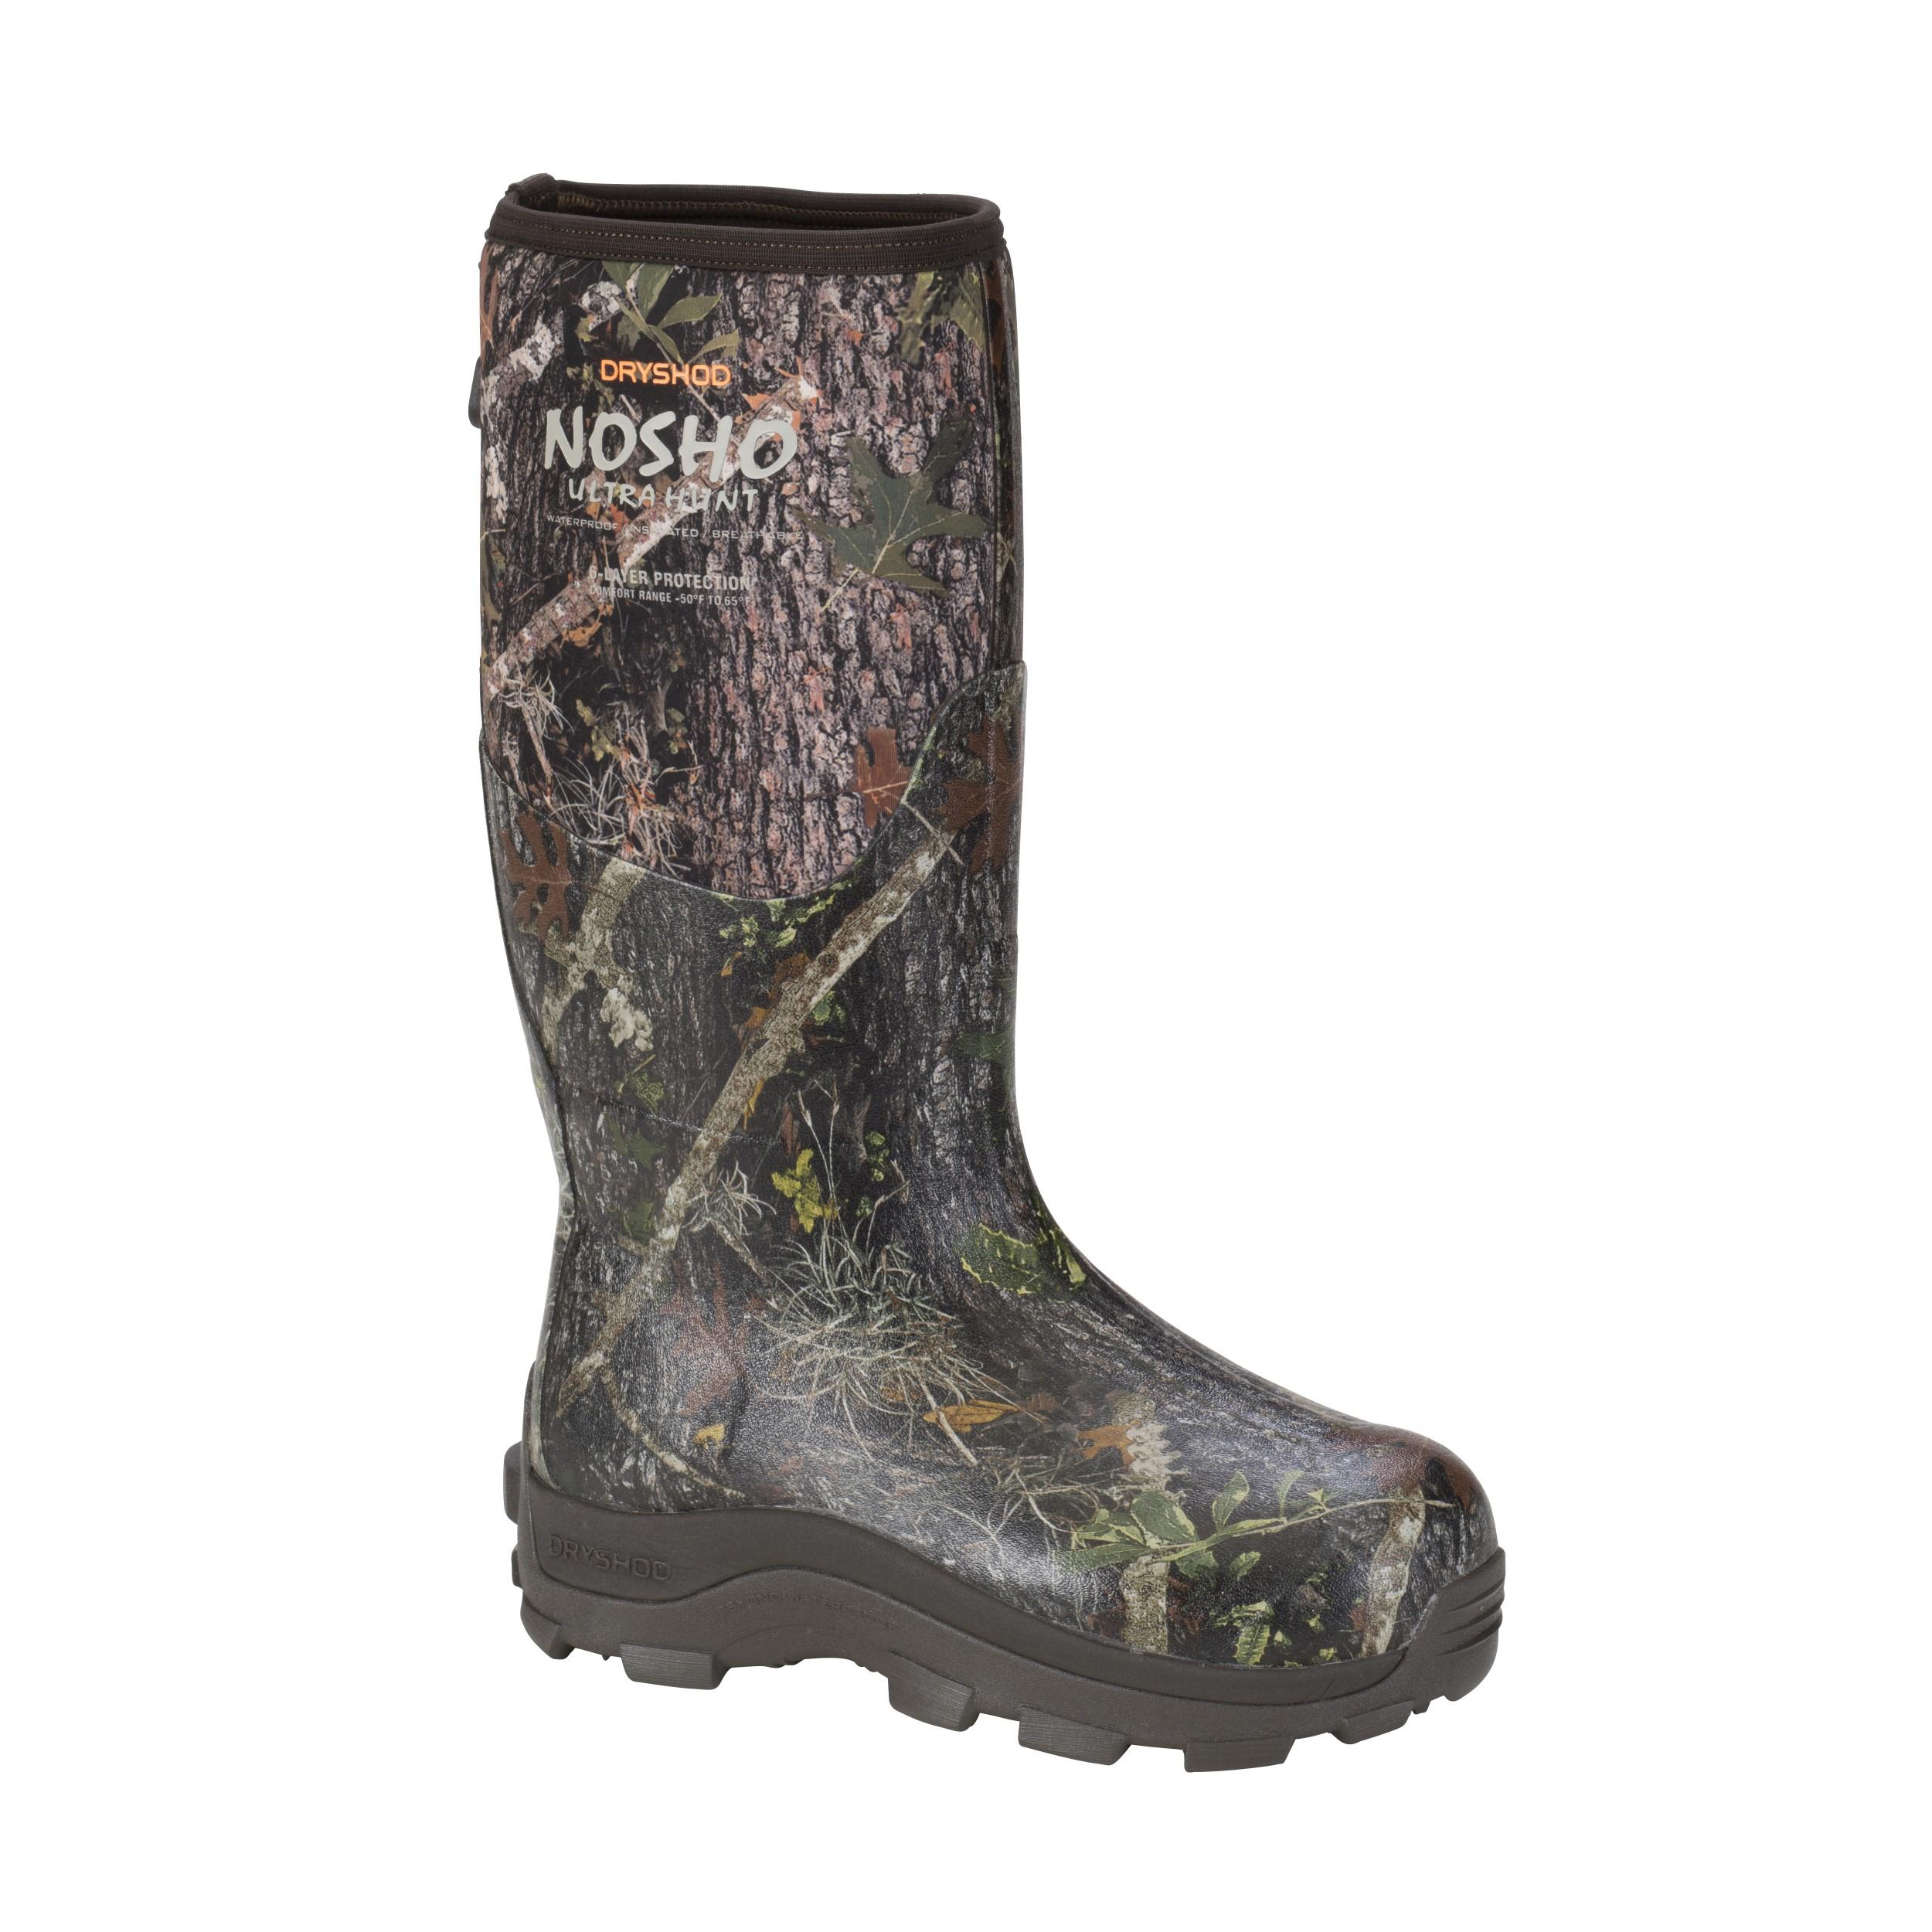 DRYSHOD Mens NoSho Ultra Hunt Camo Hunting Boot (MBM-MH-CM)